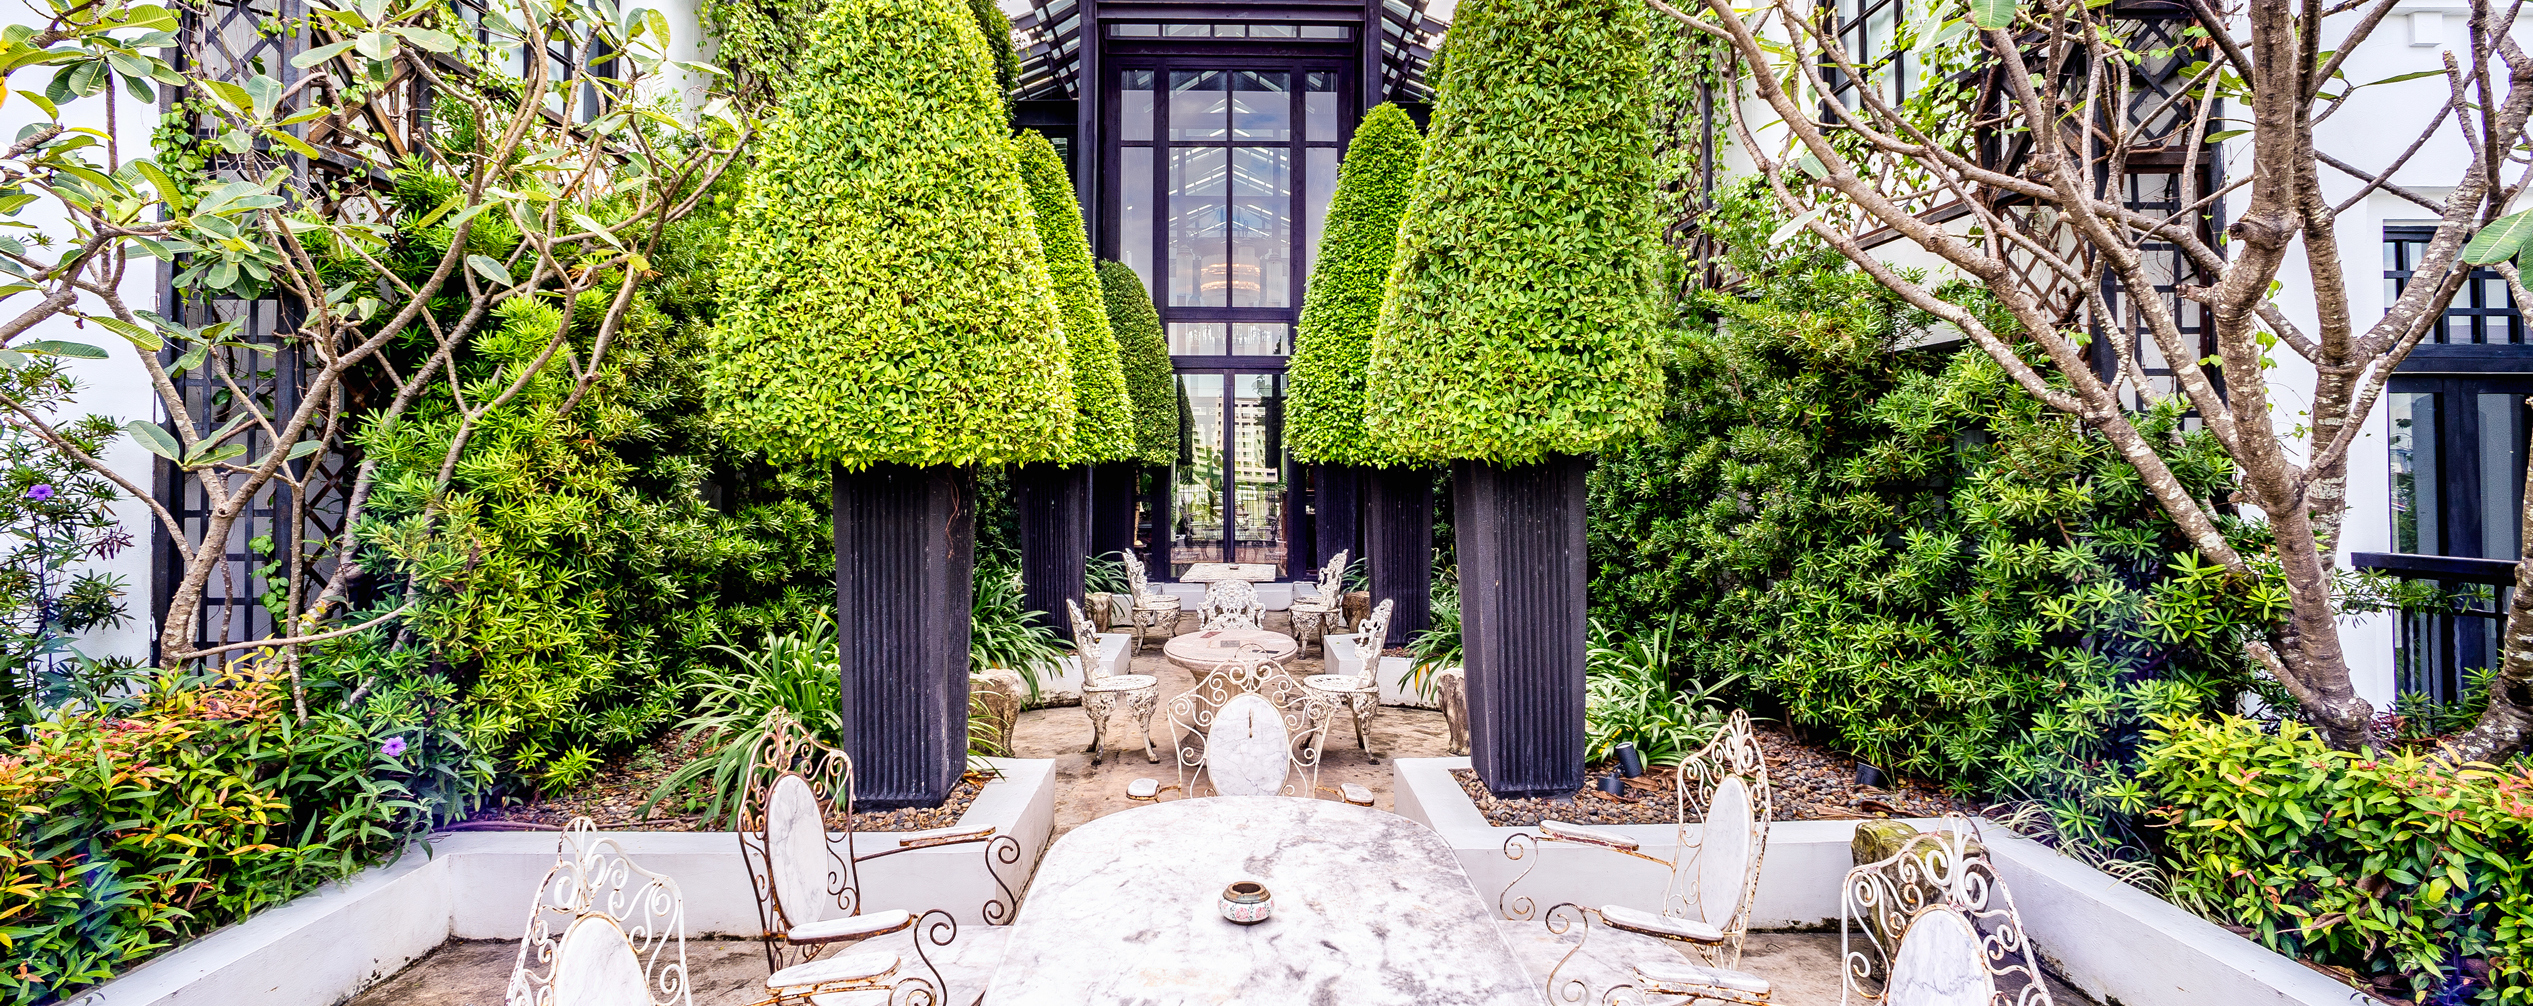 The-Siam-Hotel-English-Garden